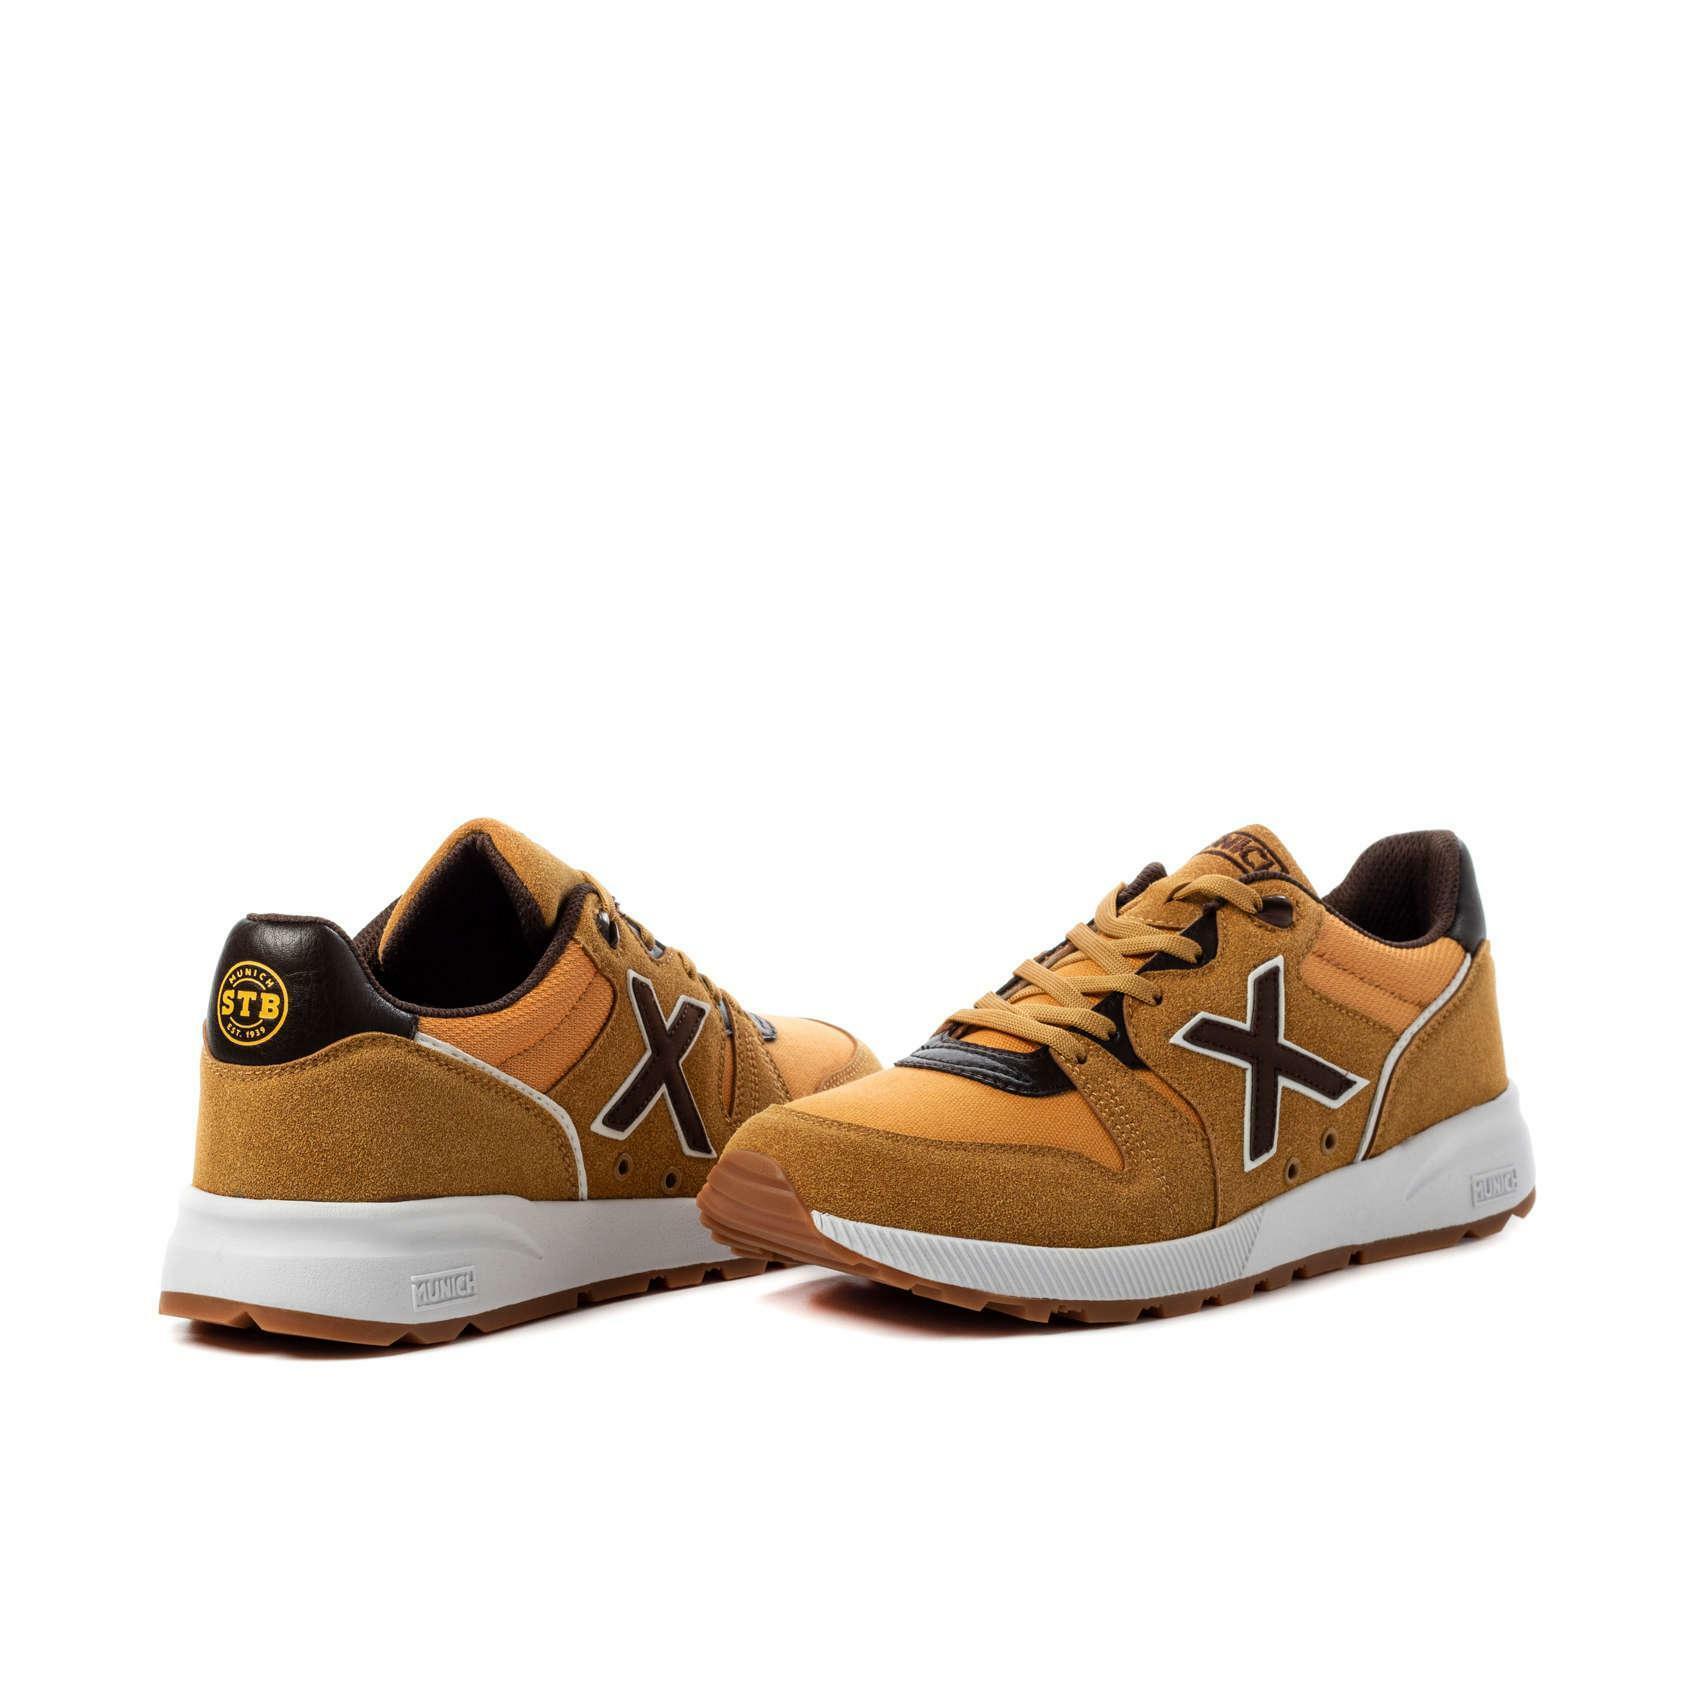 munich munich scarpa sneaker 1030 marrone chiaro